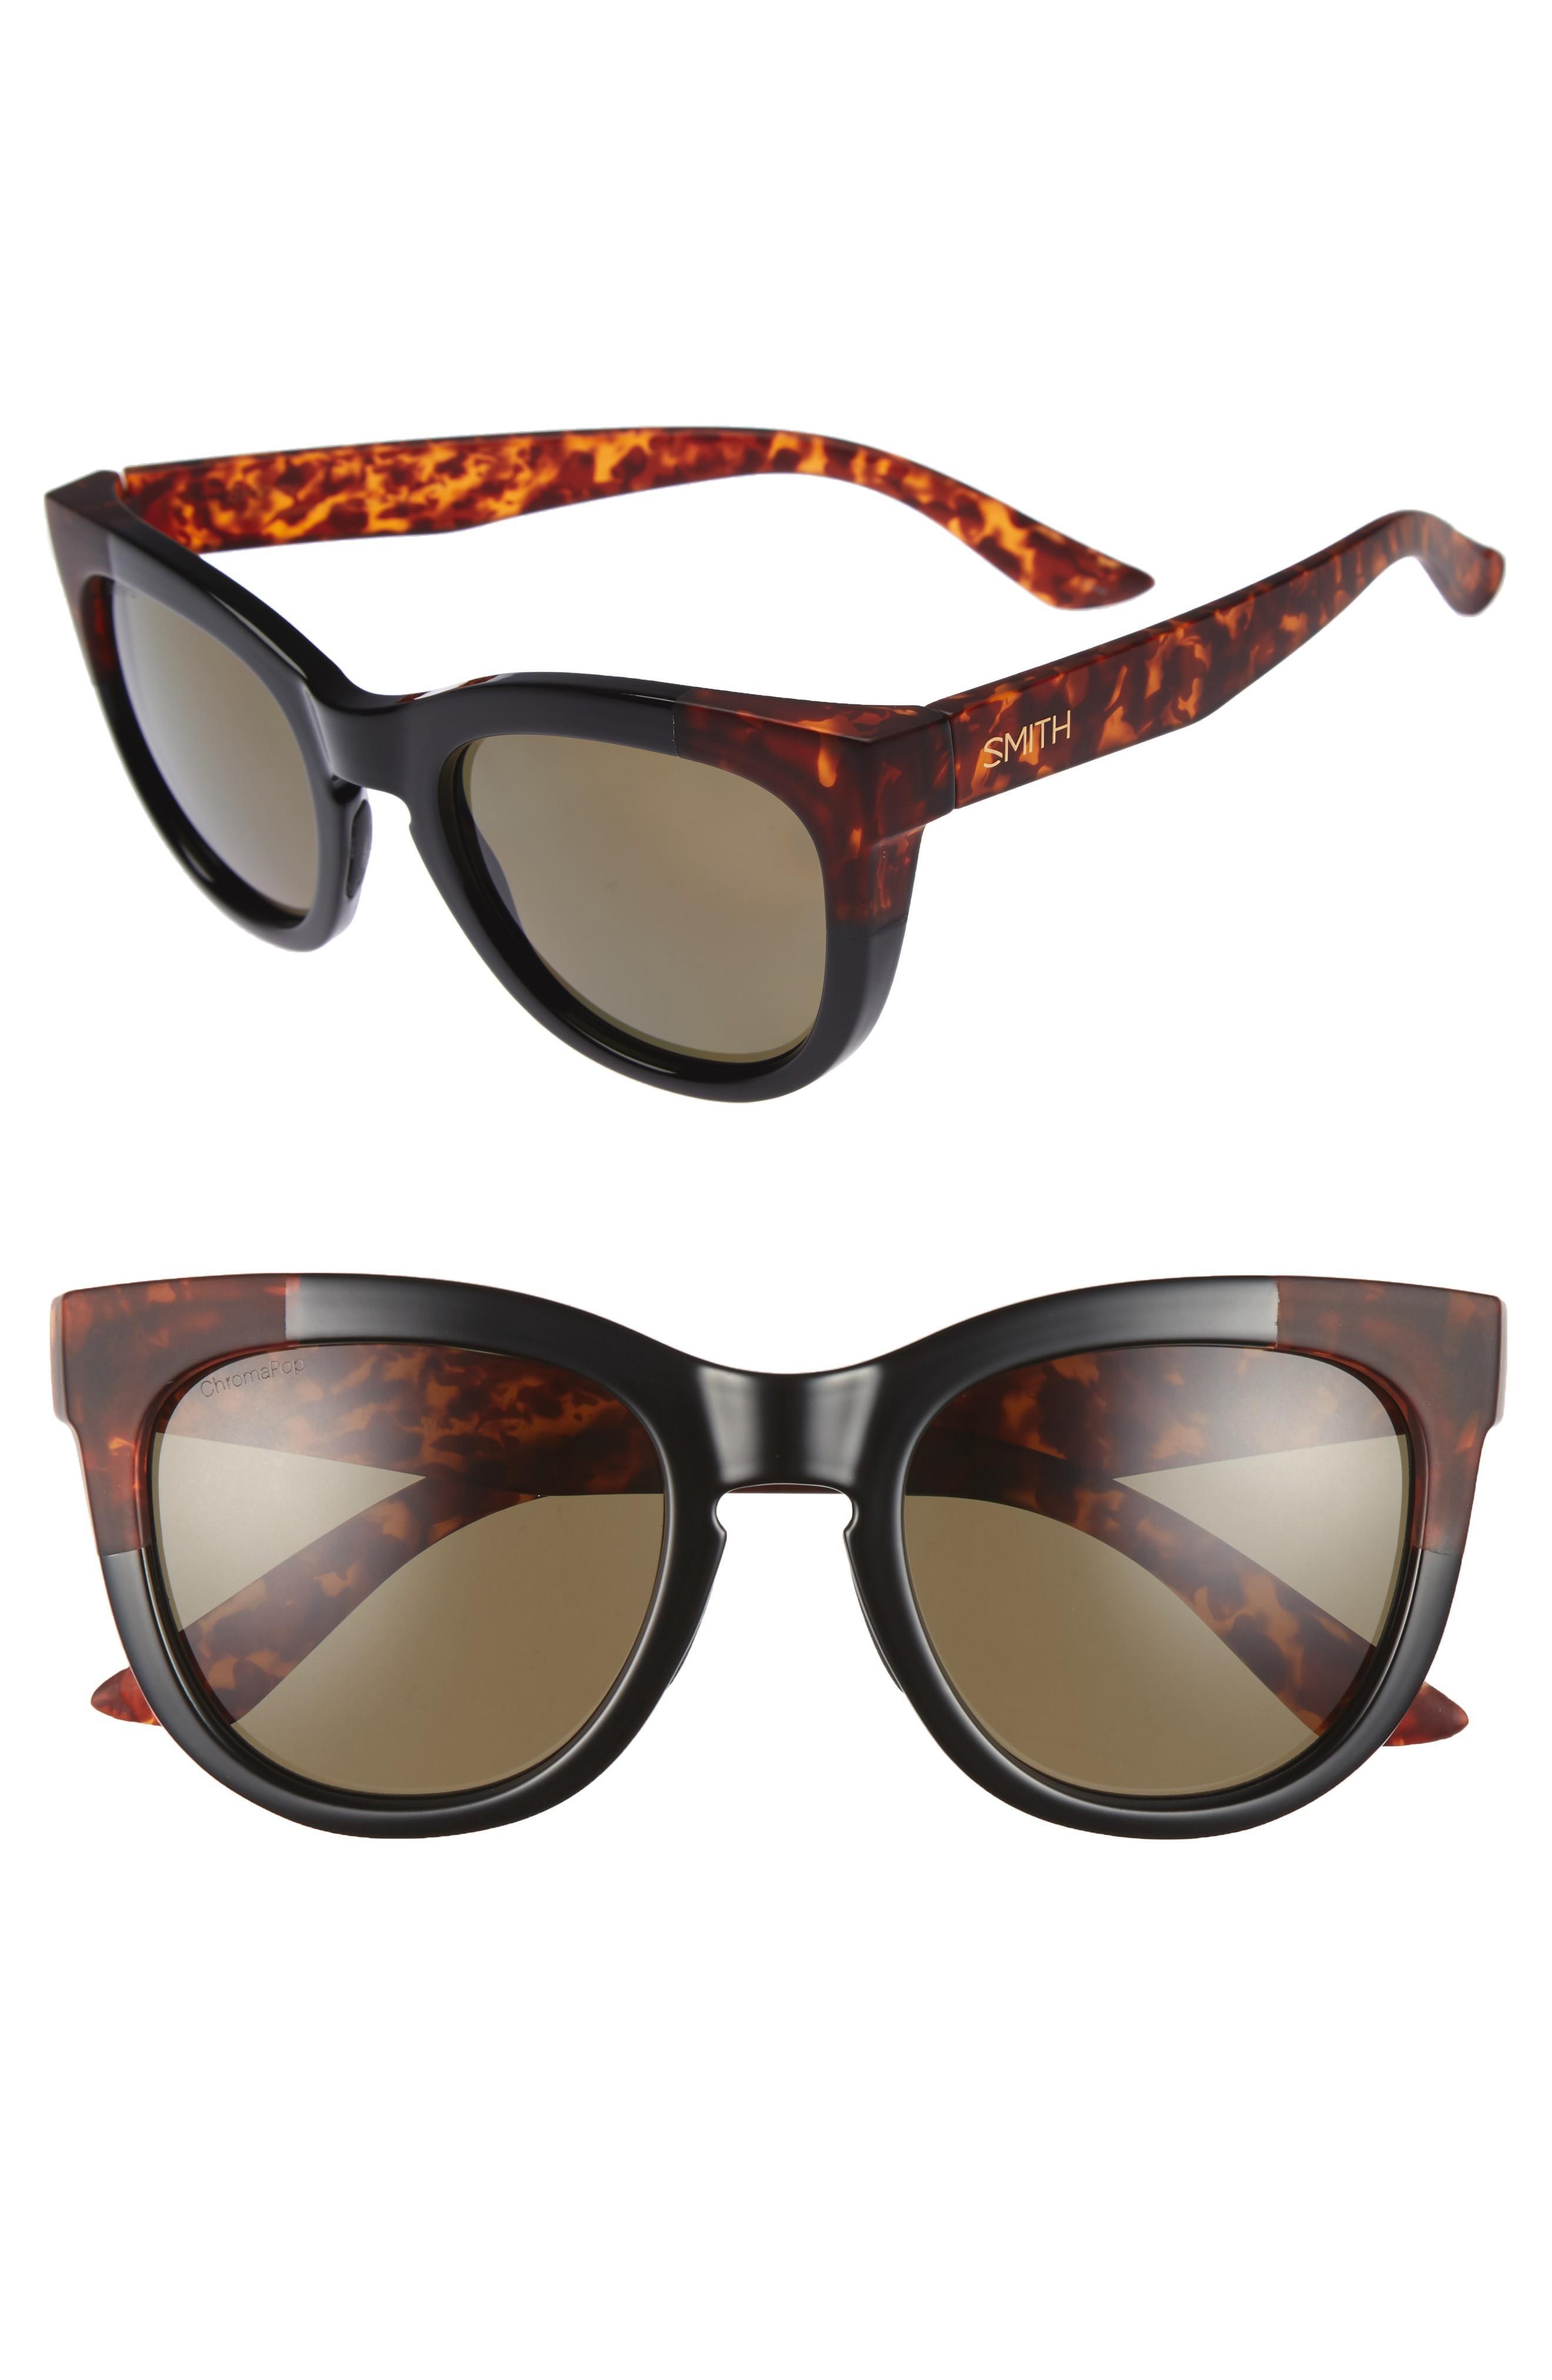 3f4158e780 Smith  Sidney  55Mm Polarized Sunglasses In Coffee  Rose Gold